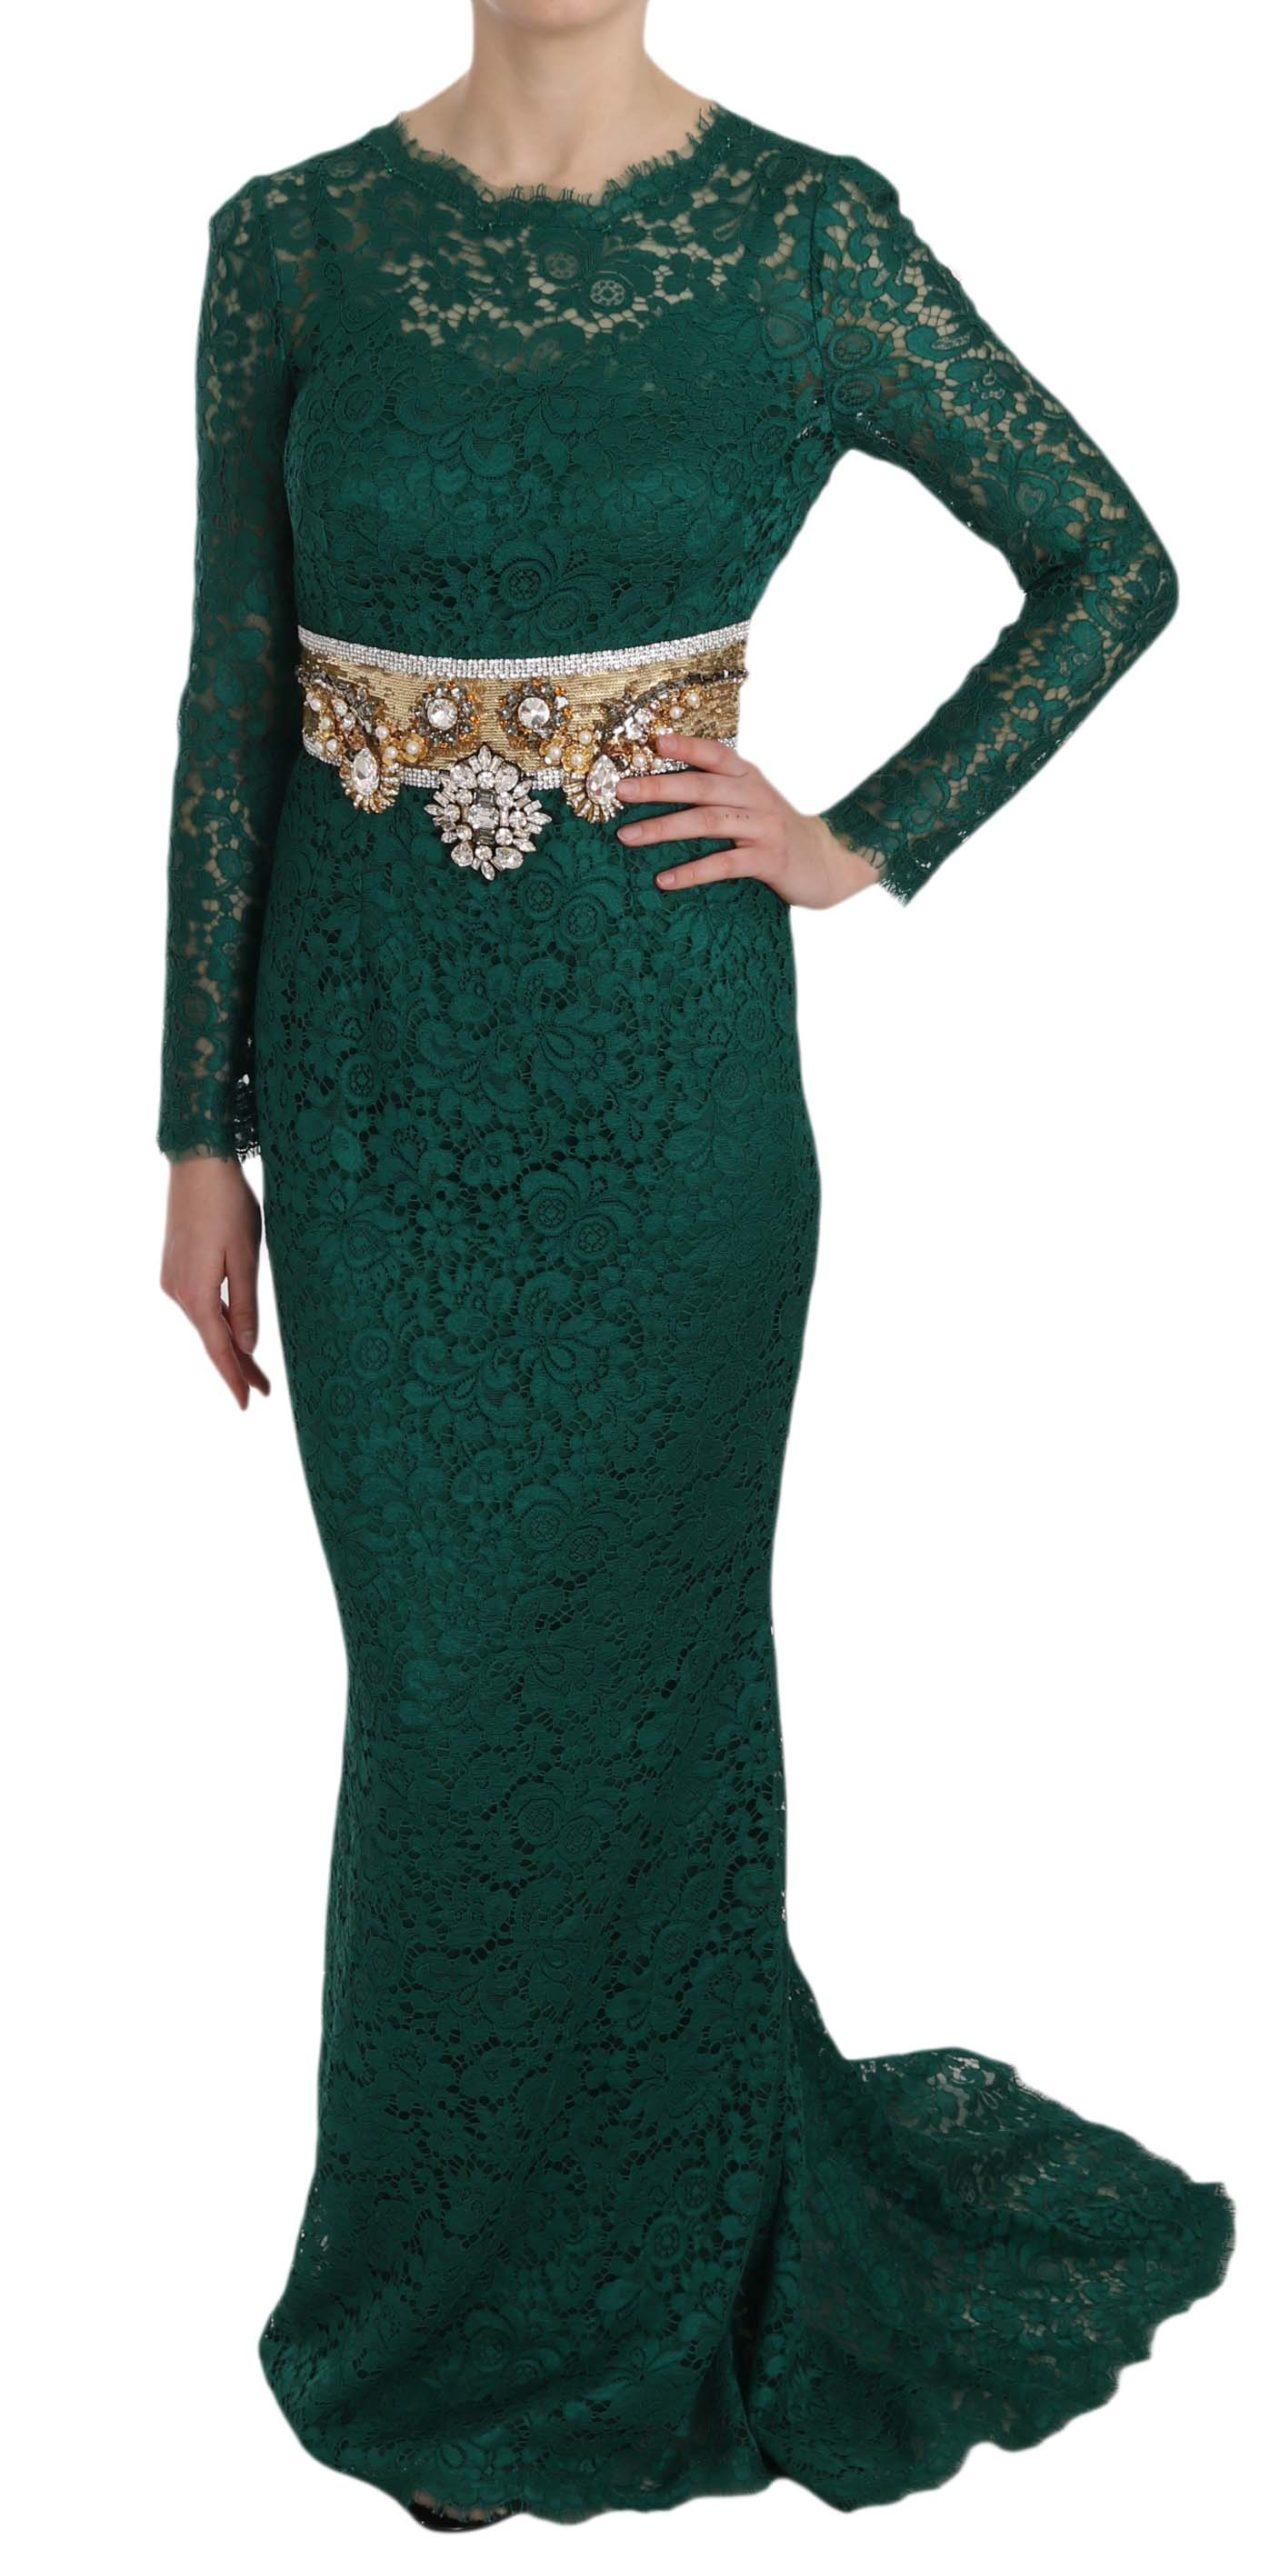 Dolce & Gabbana Women's Crystal Belt Lace Sheath Gown Dress Green DR1653 - IT42|M